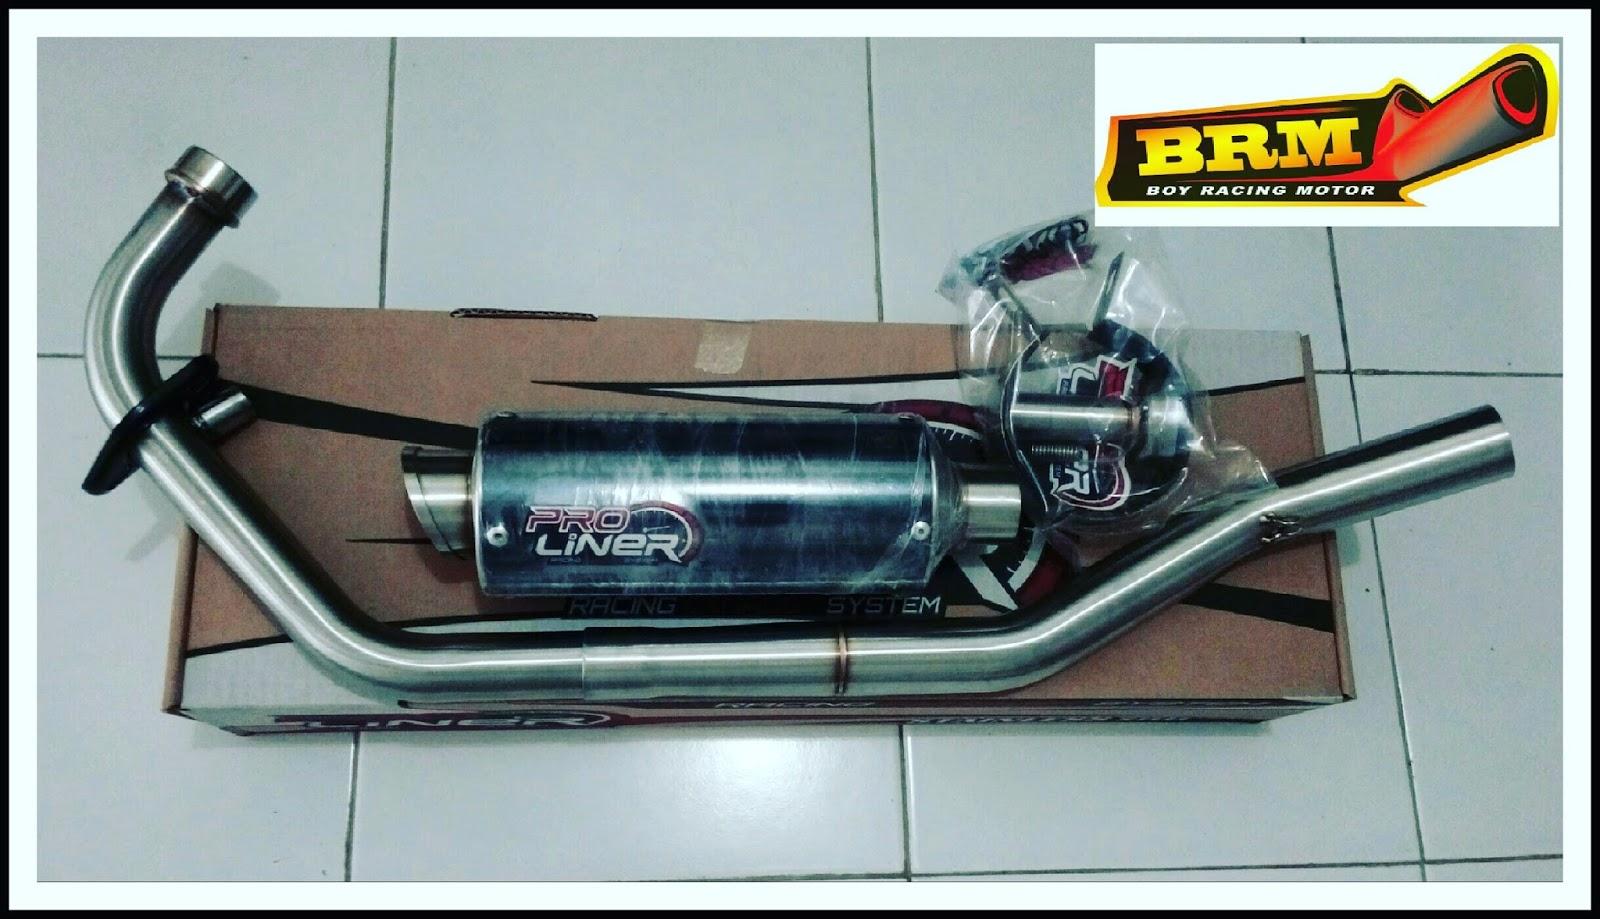 Brm Boy Racing Motor Prospeed Knalpot Byson Yamaha Exhaust Ket Pro Liner Ready Buat R25 R15